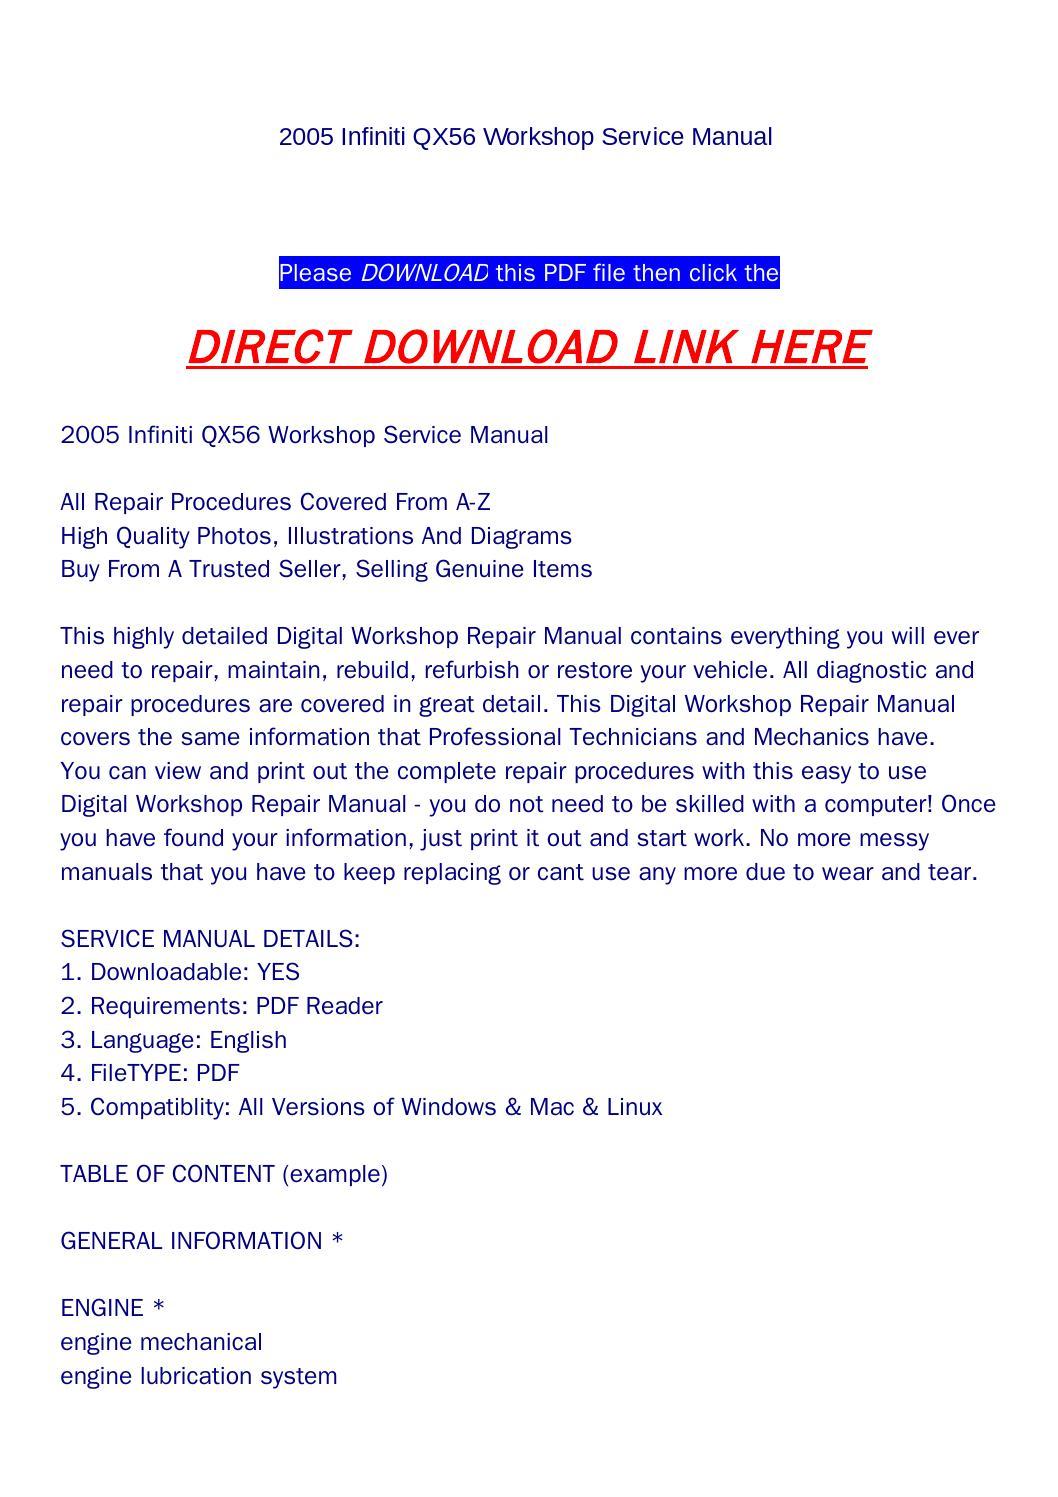 [ZHKZ_3066]  2005 infiniti qx56 workshop service manual by backoiiew2 - issuu   Wiring Diagram Rear Wiper Qx56      Issuu